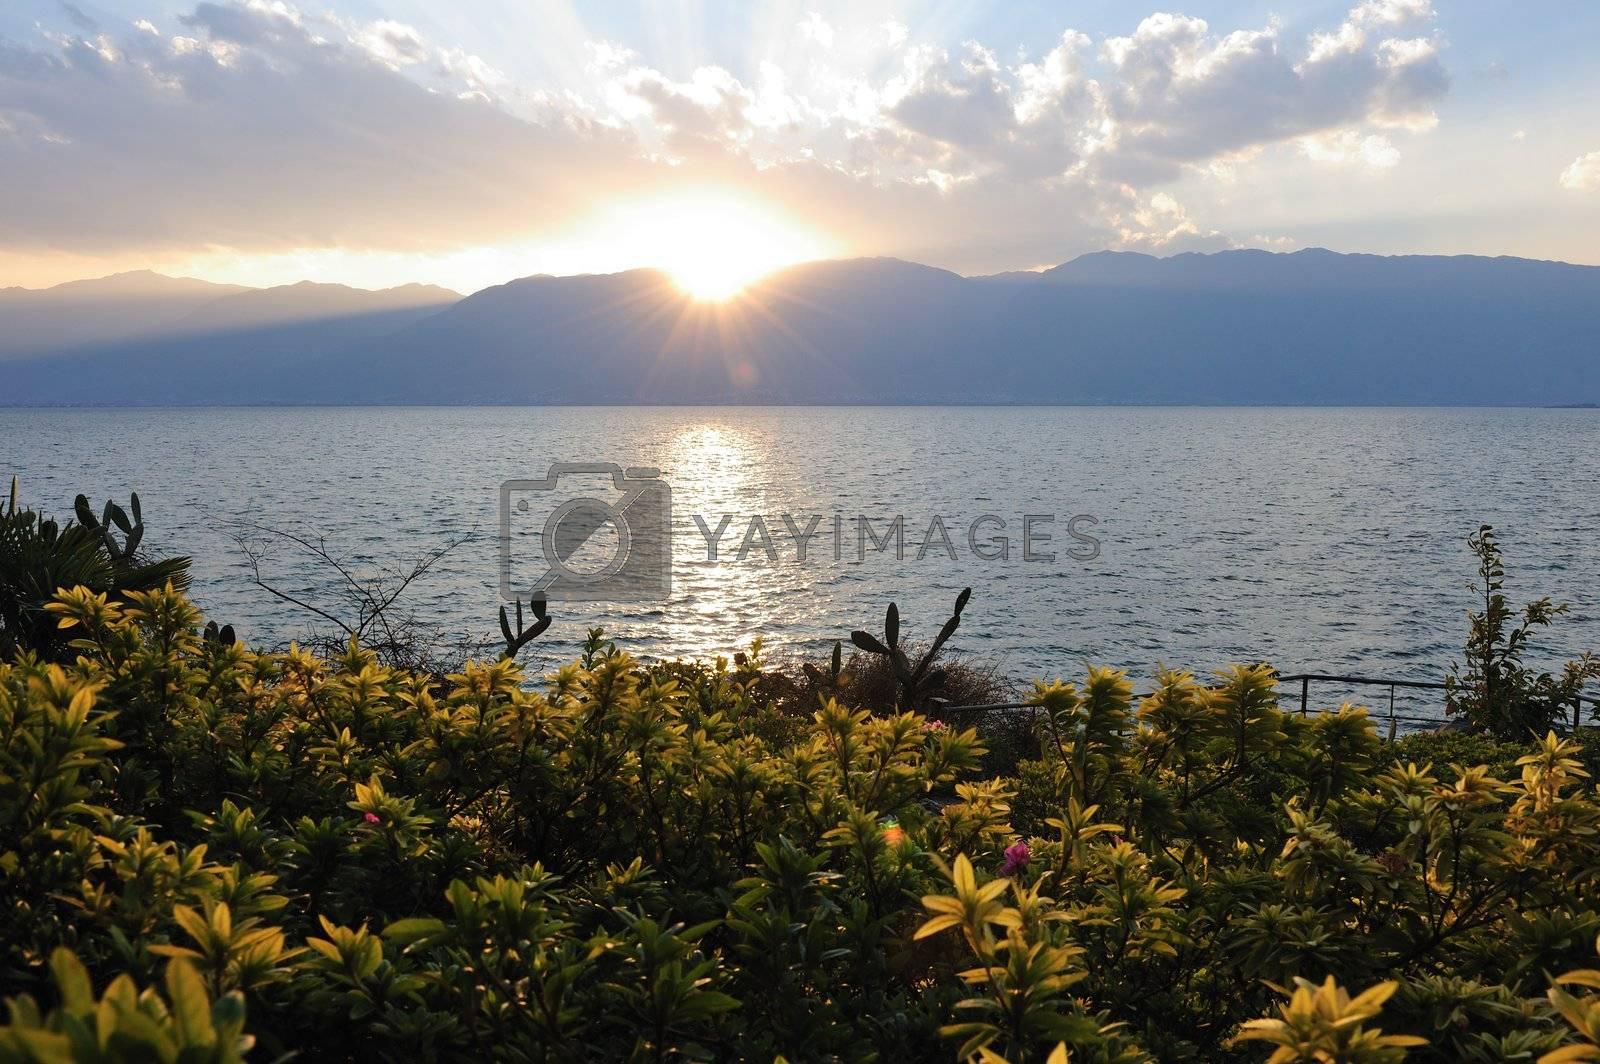 Lake sunset landscape in Dali, Yunnan province of China